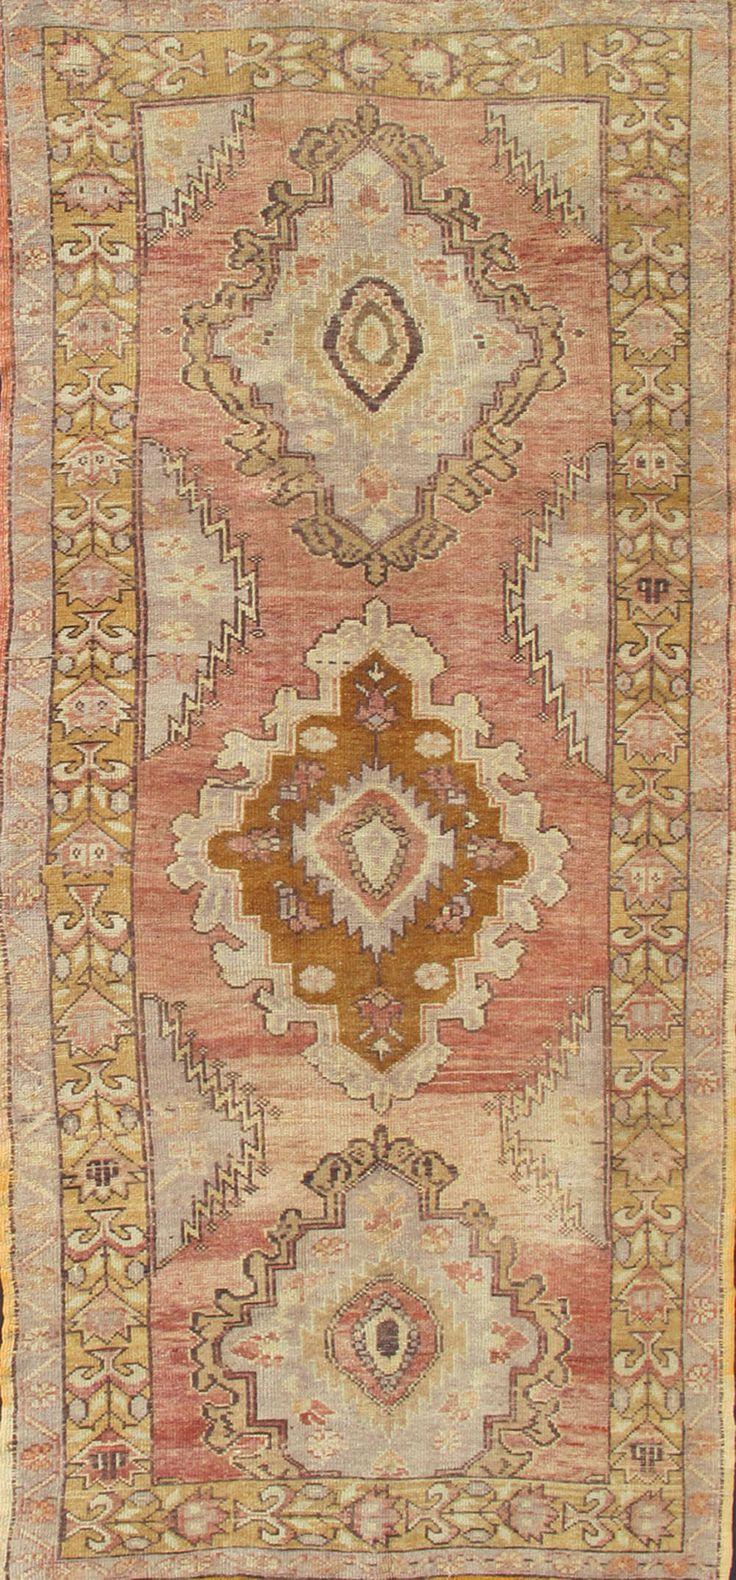 Circa : 1930 Type : Oushak Origin : Turkey Design : Medallion Material : Wool Texture : Pile